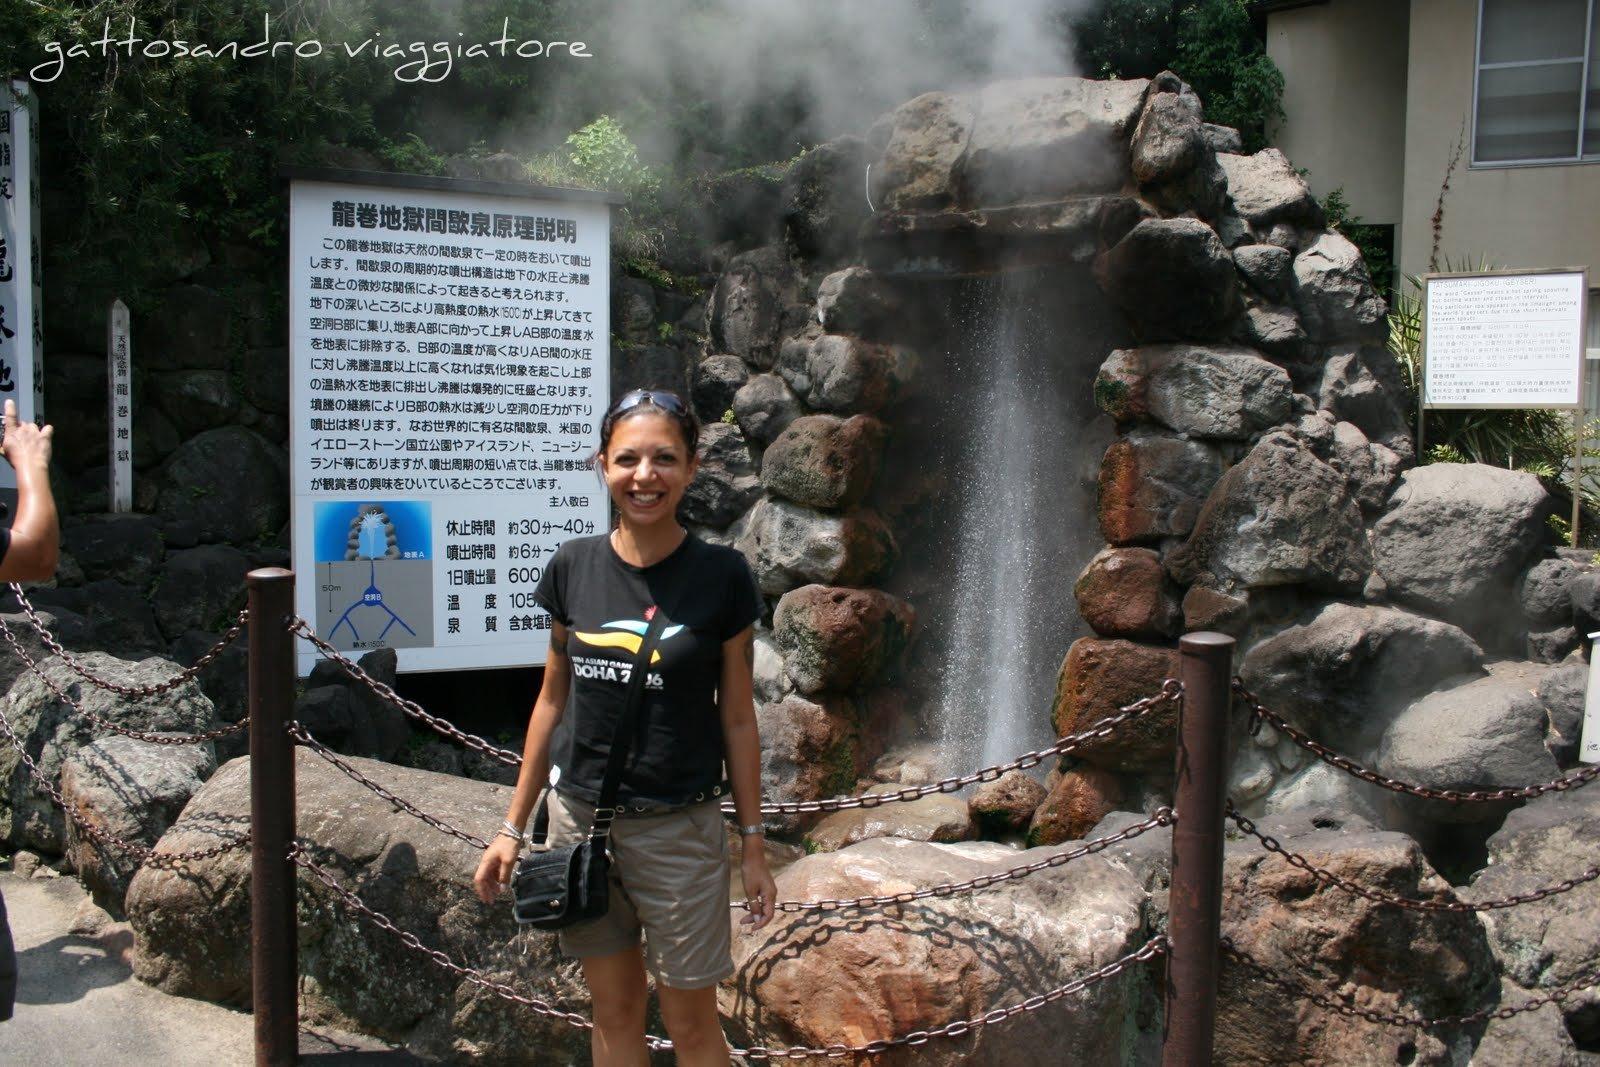 gattosandro viaggiatore - travel blog: A Beppu tra inferni ...